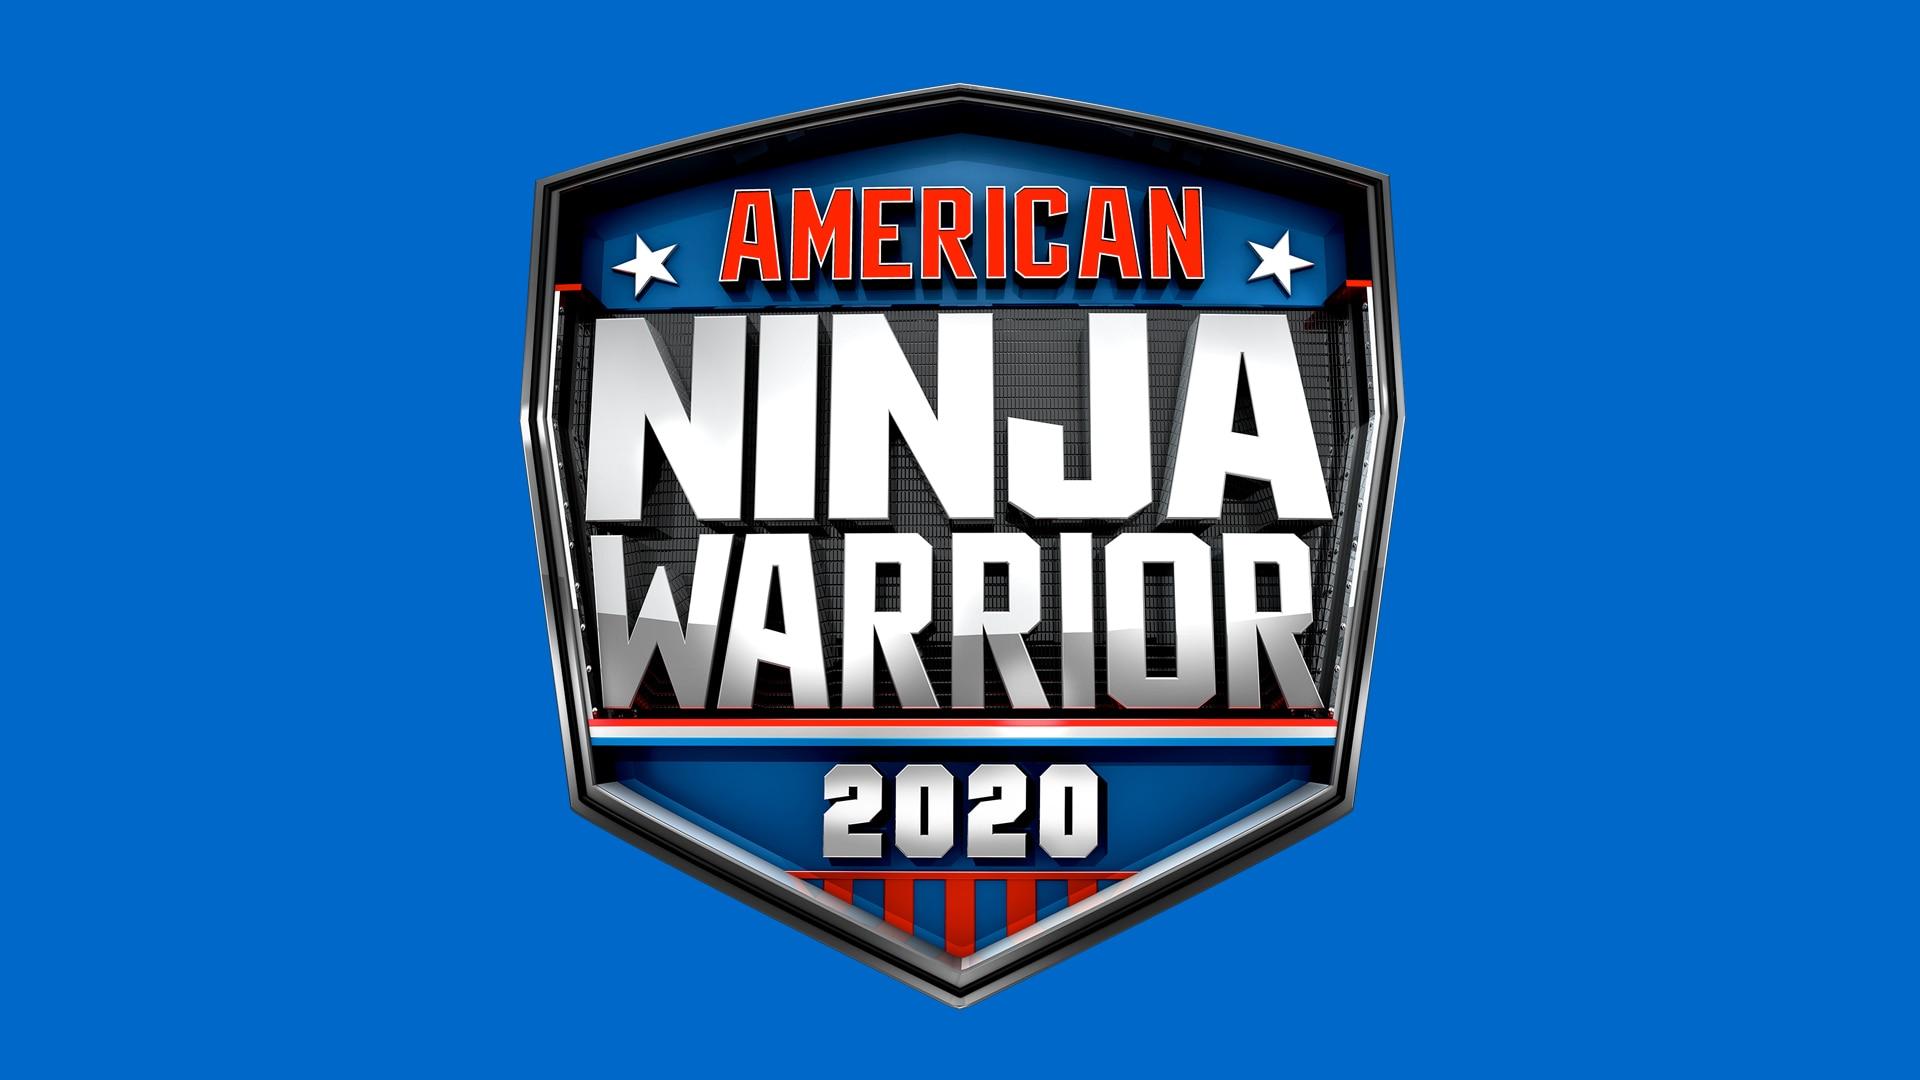 American Ninja Warrior on FREECABLE TV